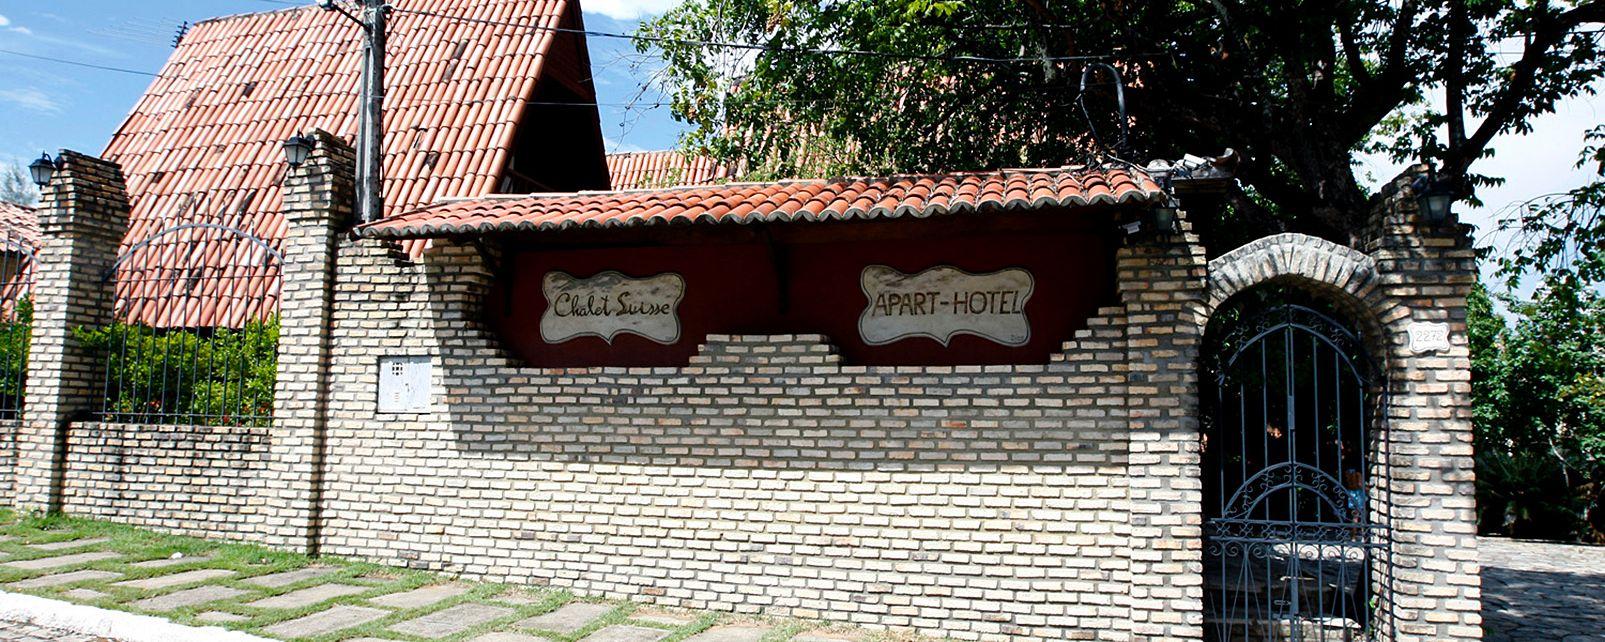 Hotel Chalet Suisse